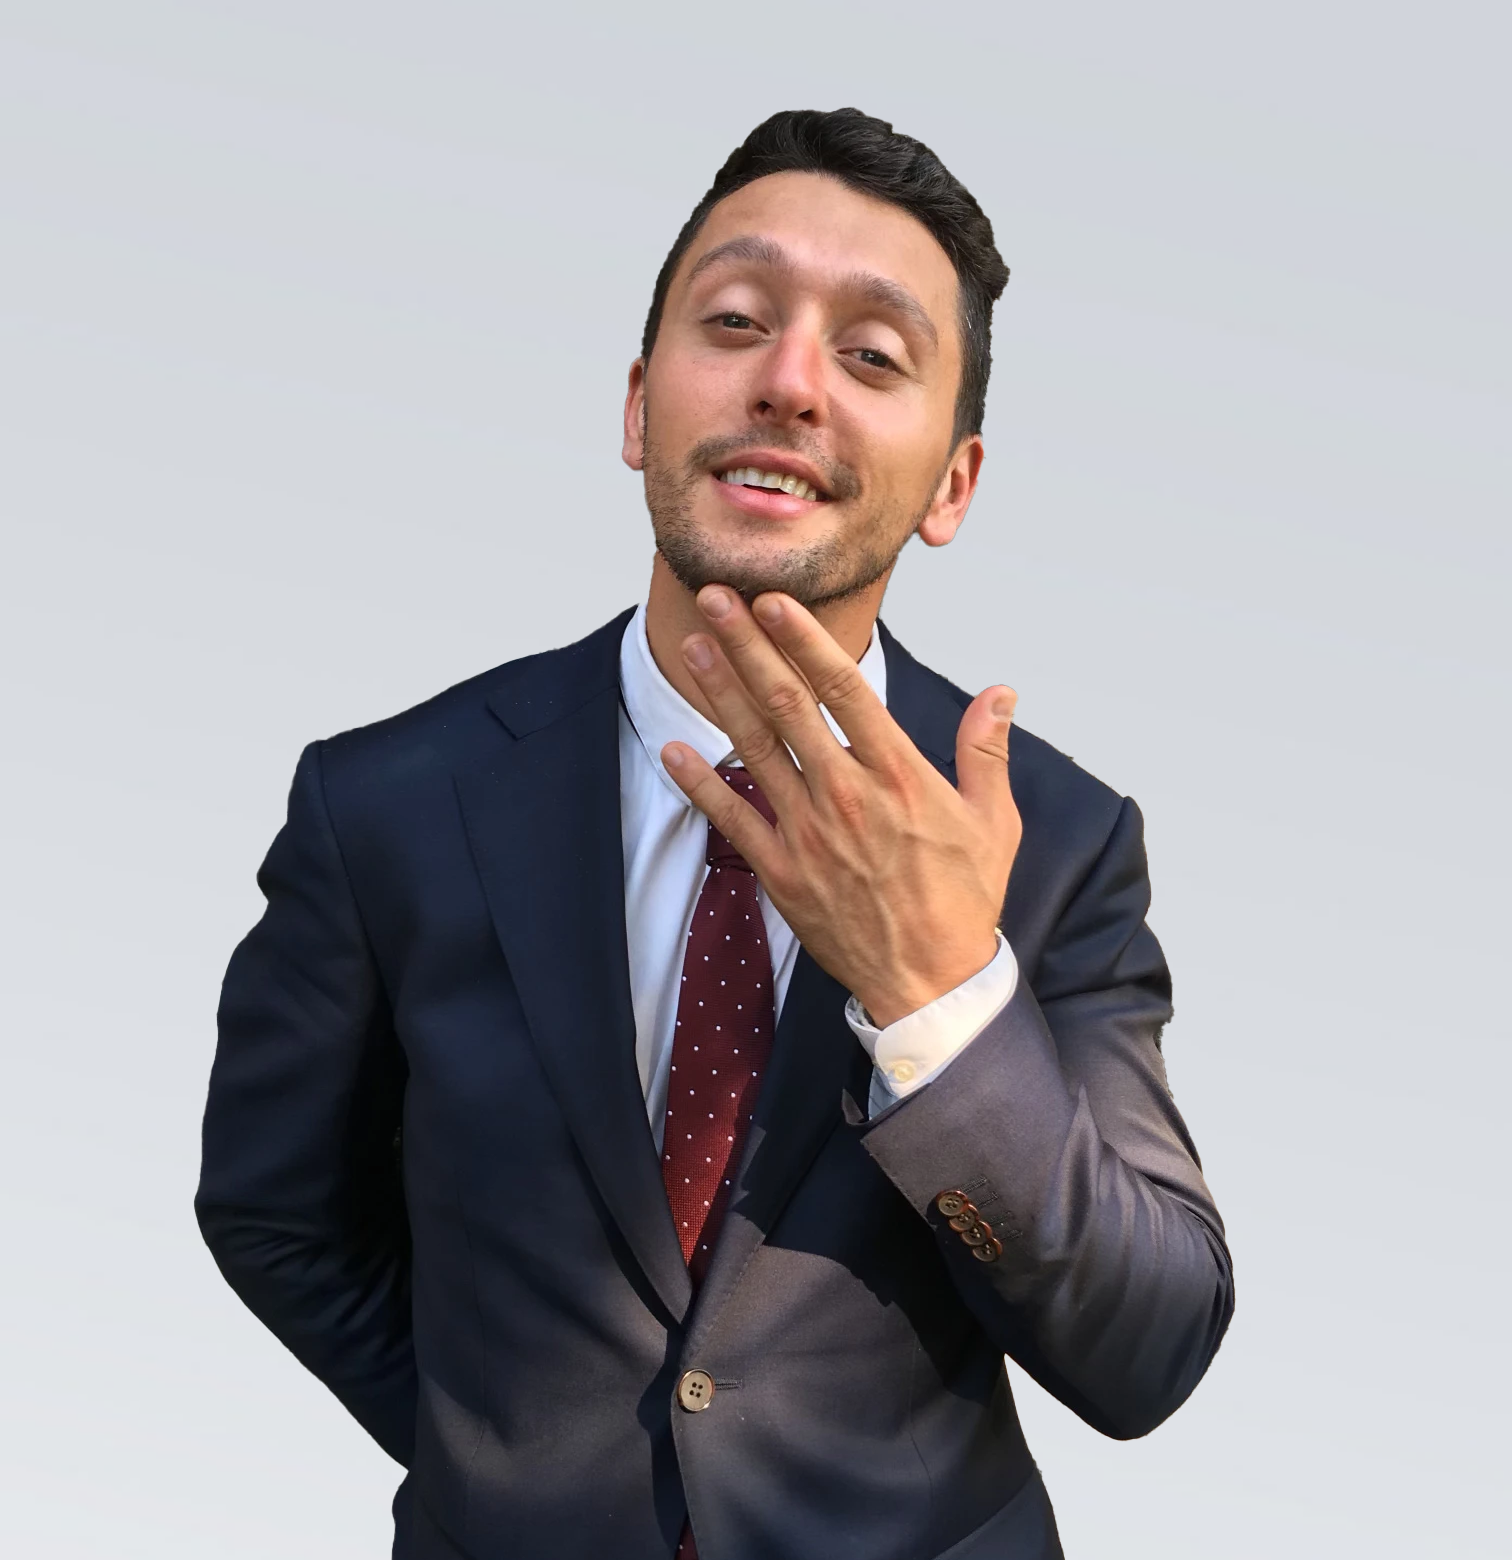 Mark El-Rayes Web Designer at Connect CRE